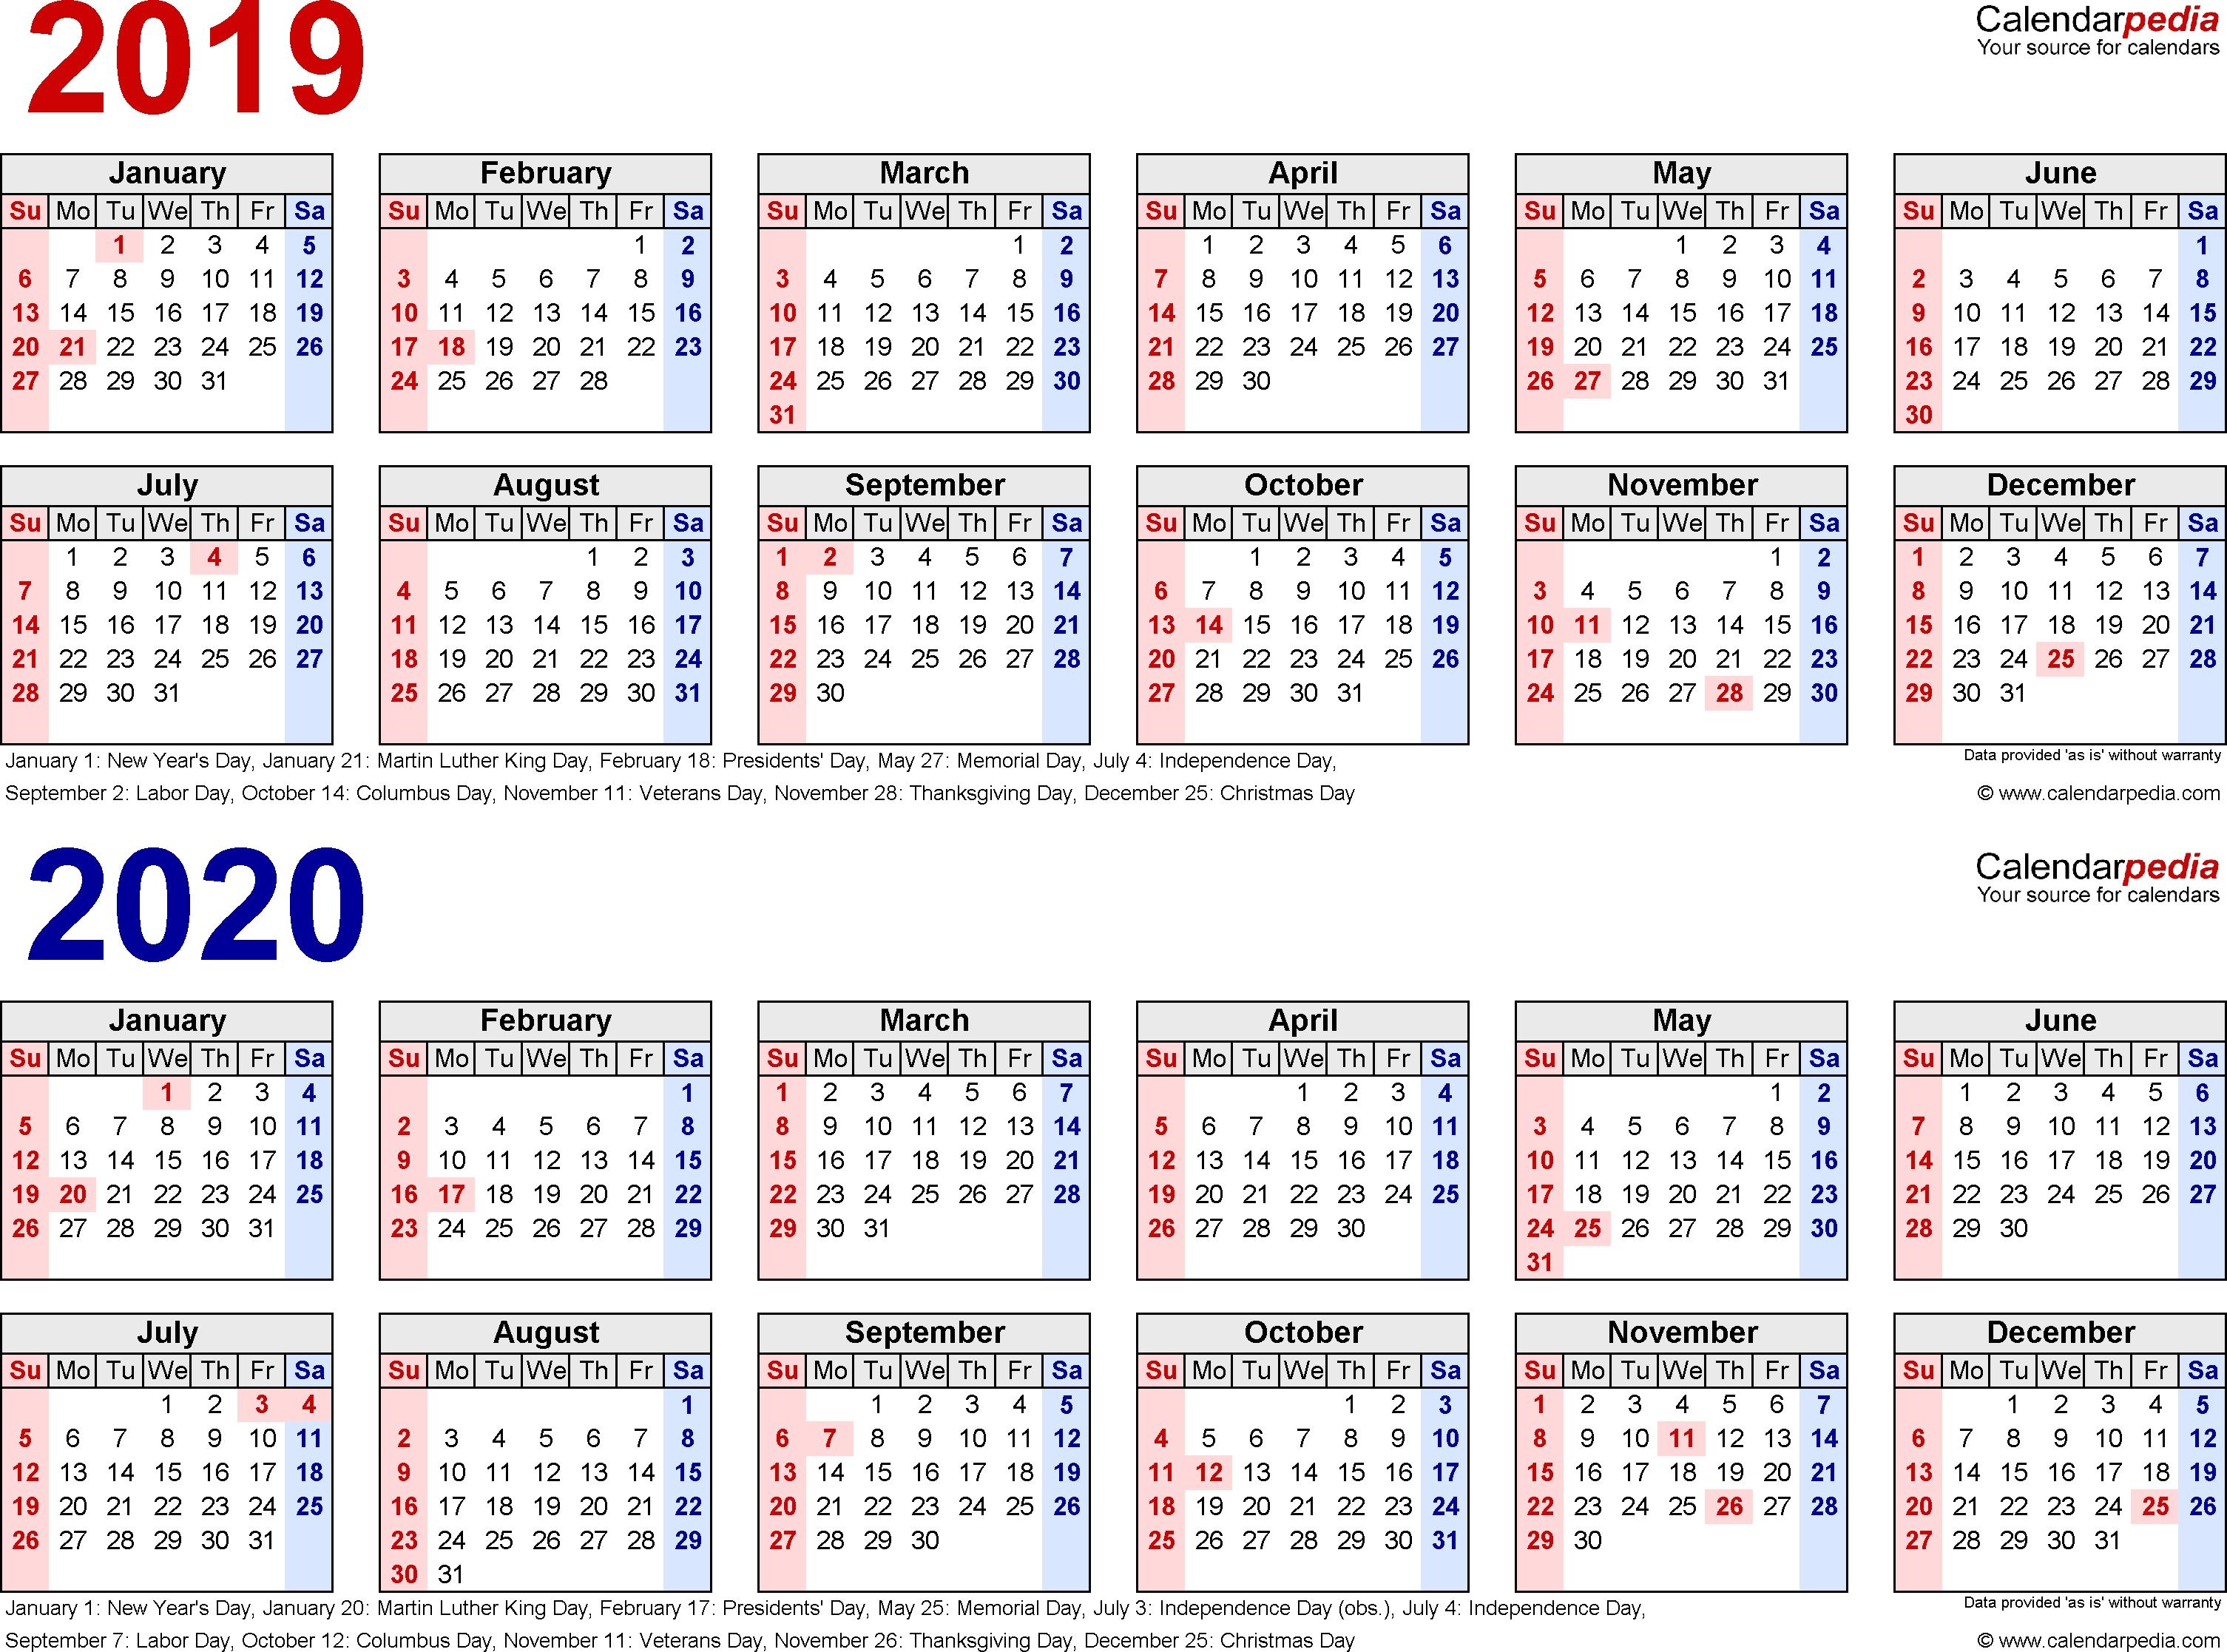 2019-2020 Calendar - Free Printable Two-Year Pdf Calendars in July 2019 To June 2020 Calendar